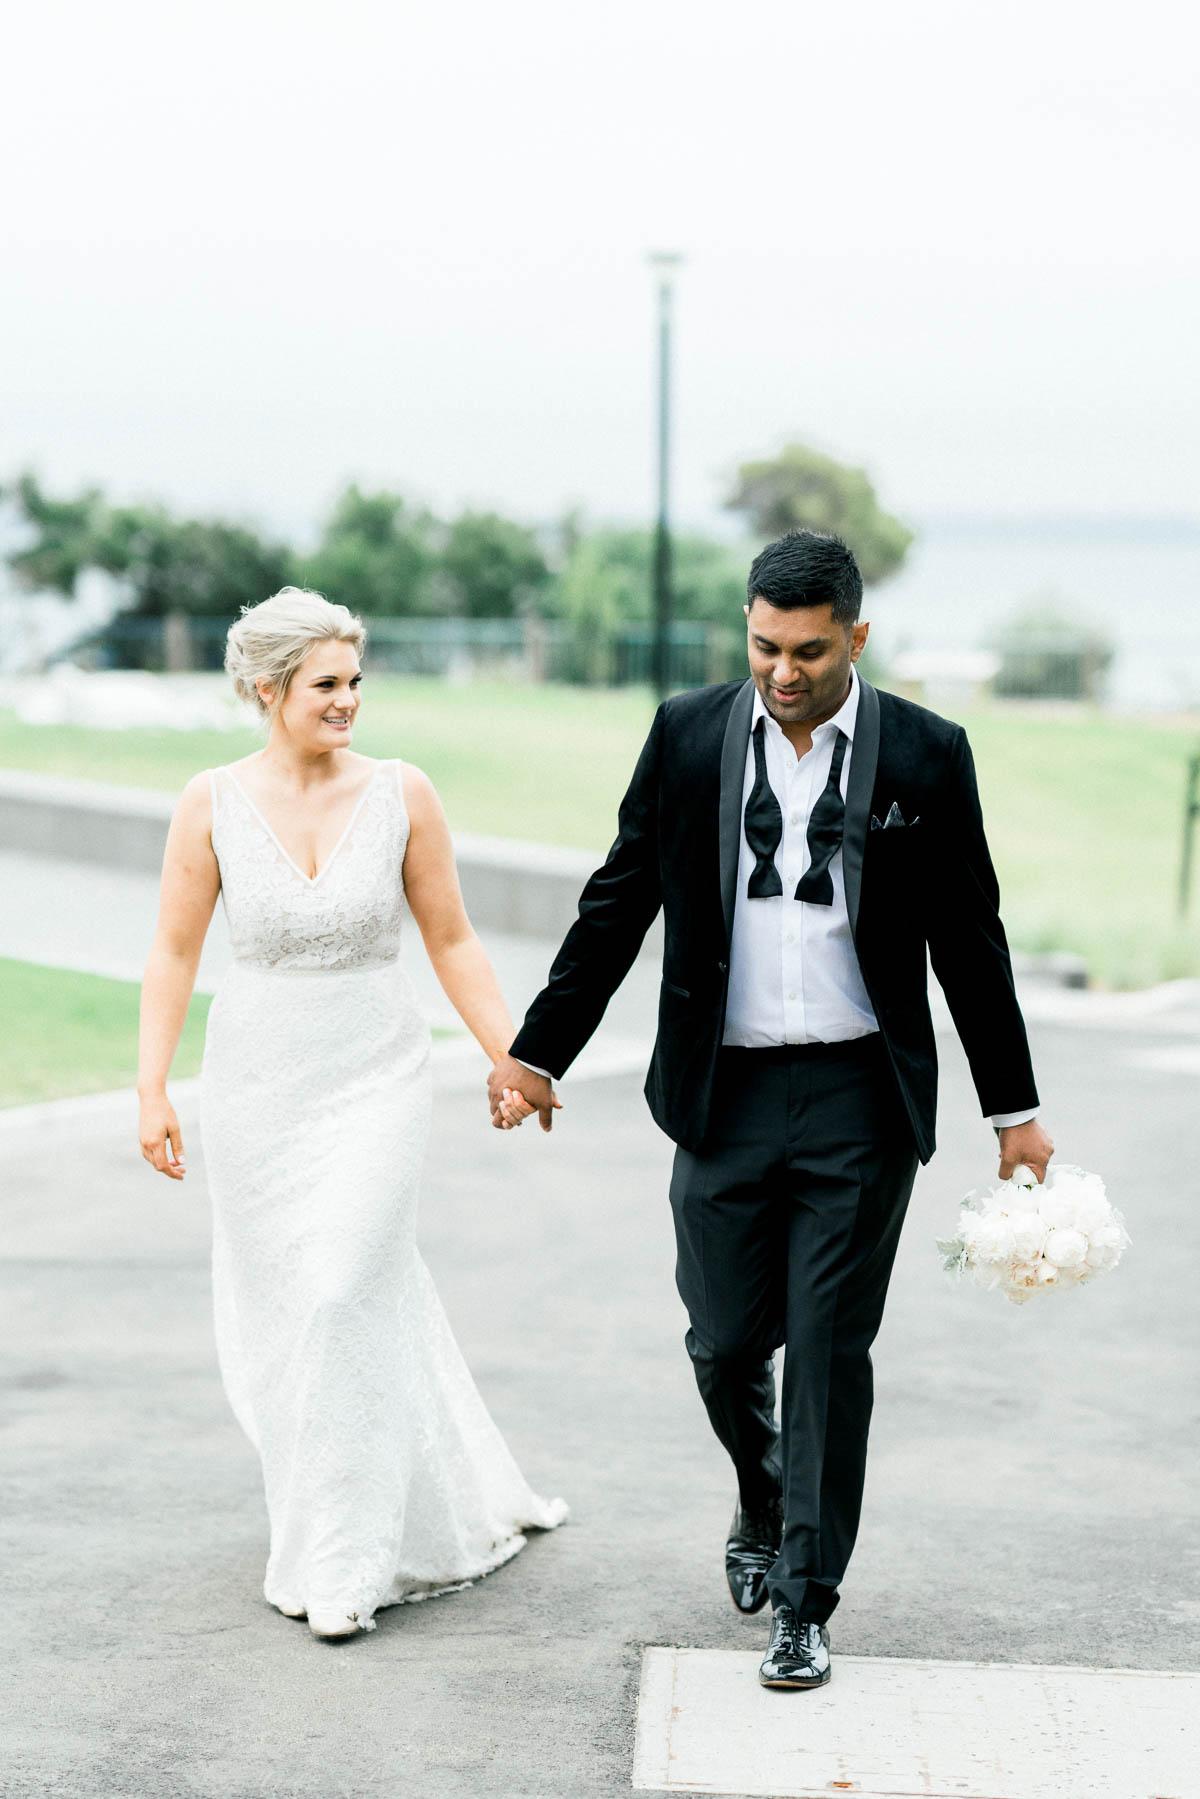 trenavin-chapel-phillip-island-wedding-heart+soul-weddings-sally-sean-01820.jpg